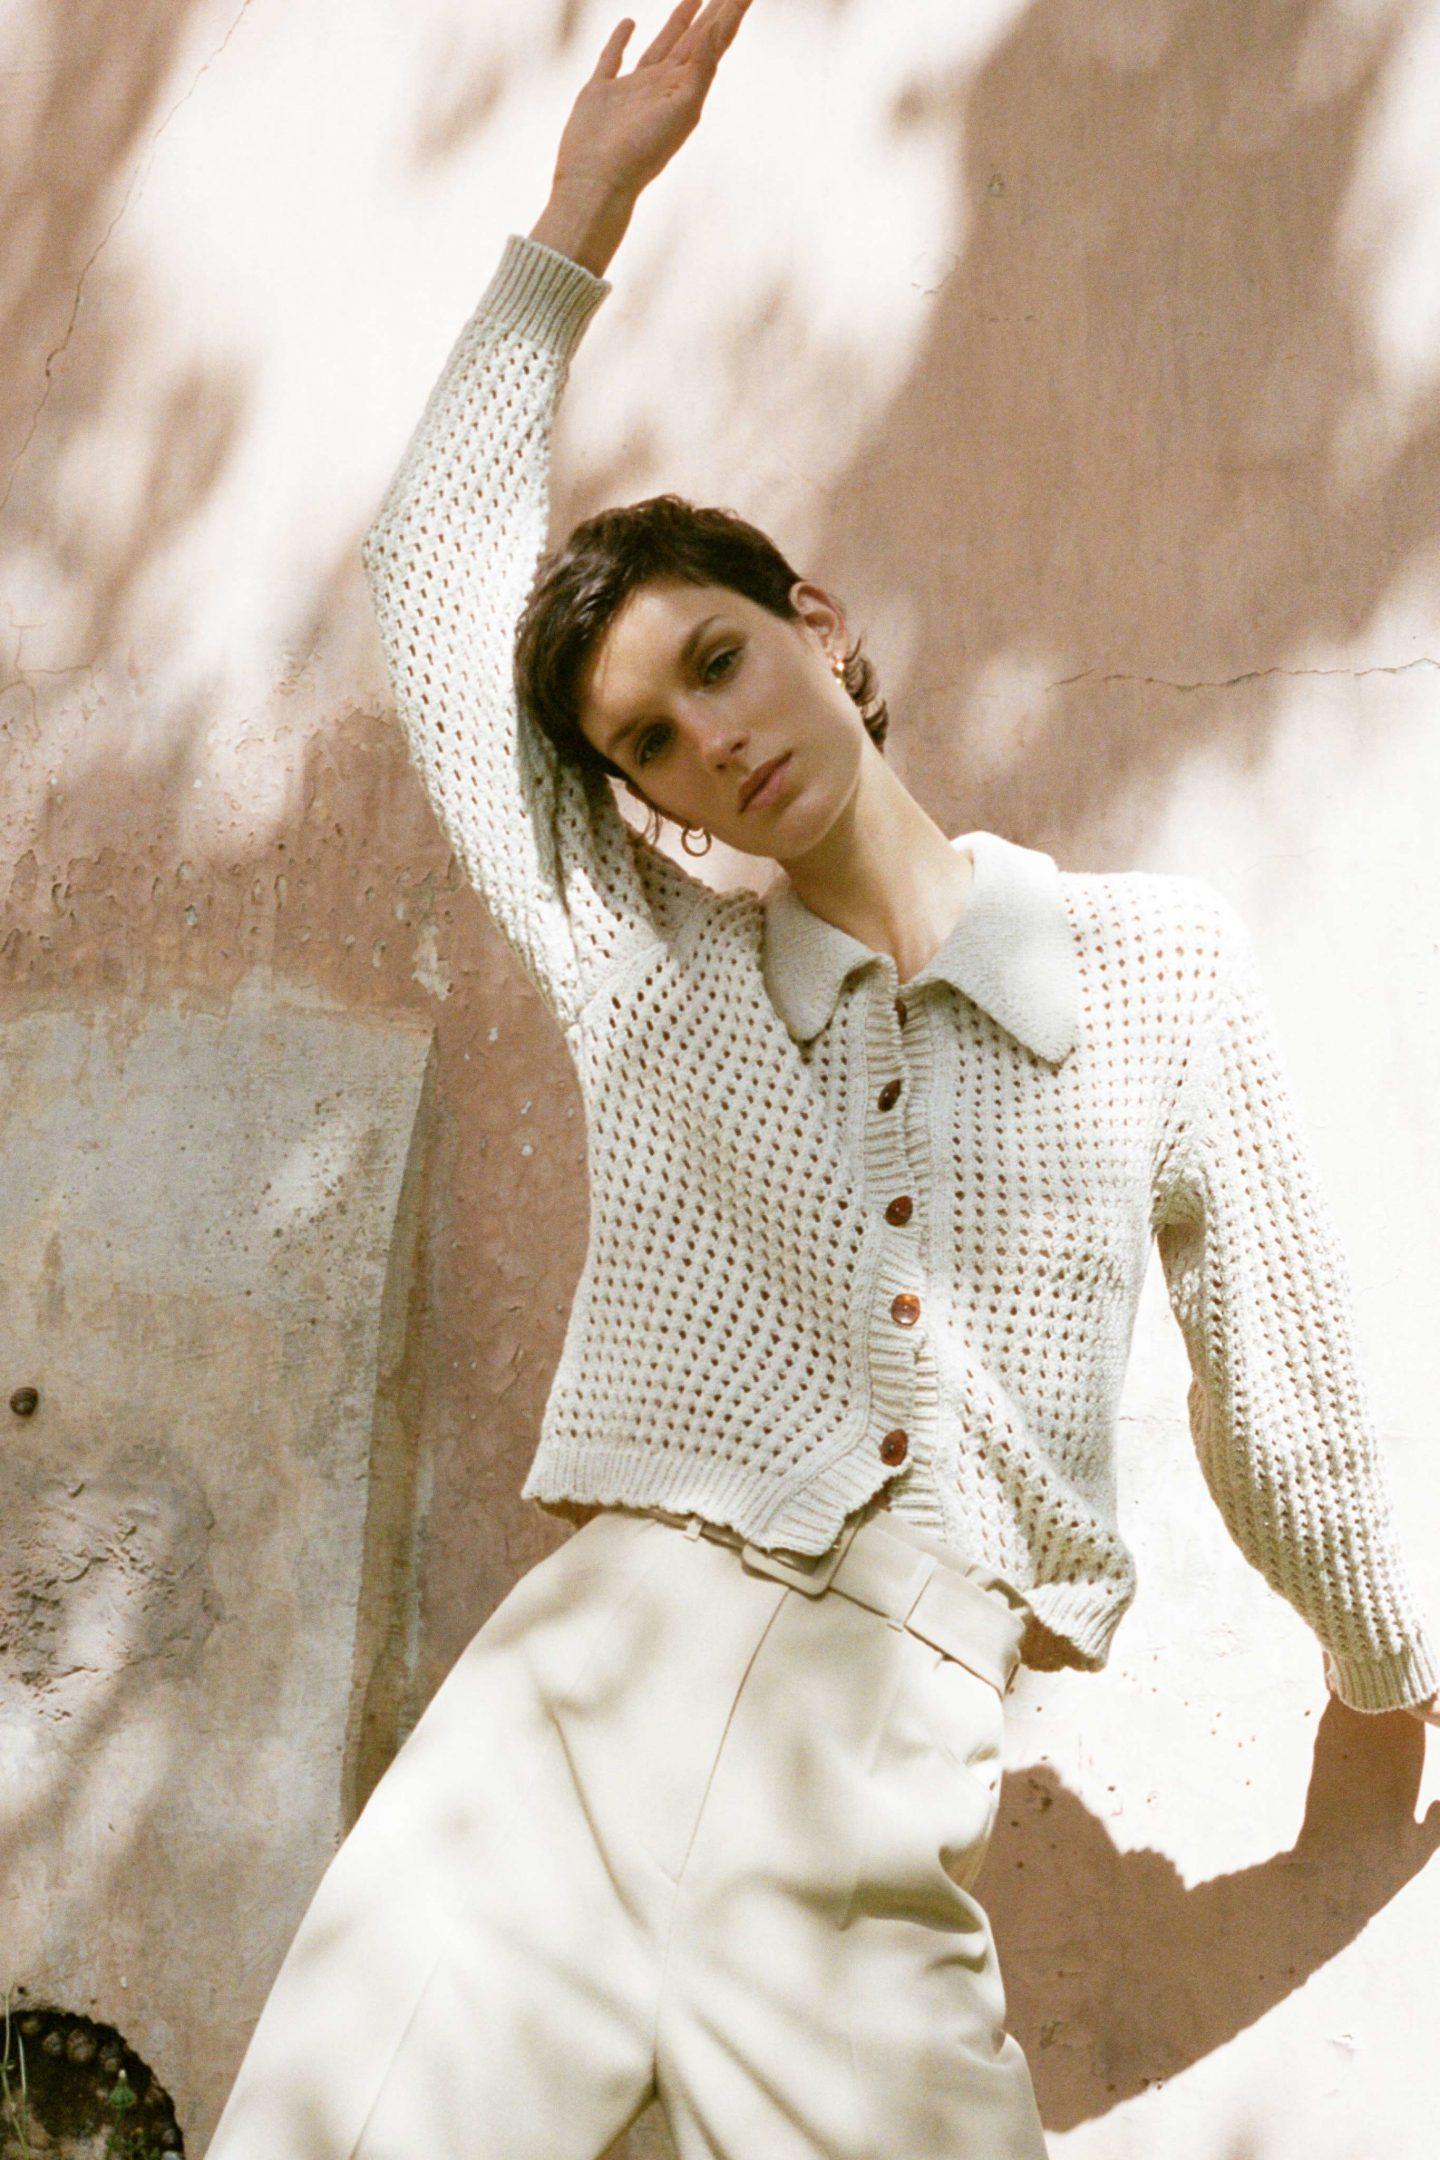 Fashion 101 認識設計師 002:Sandra Sandor